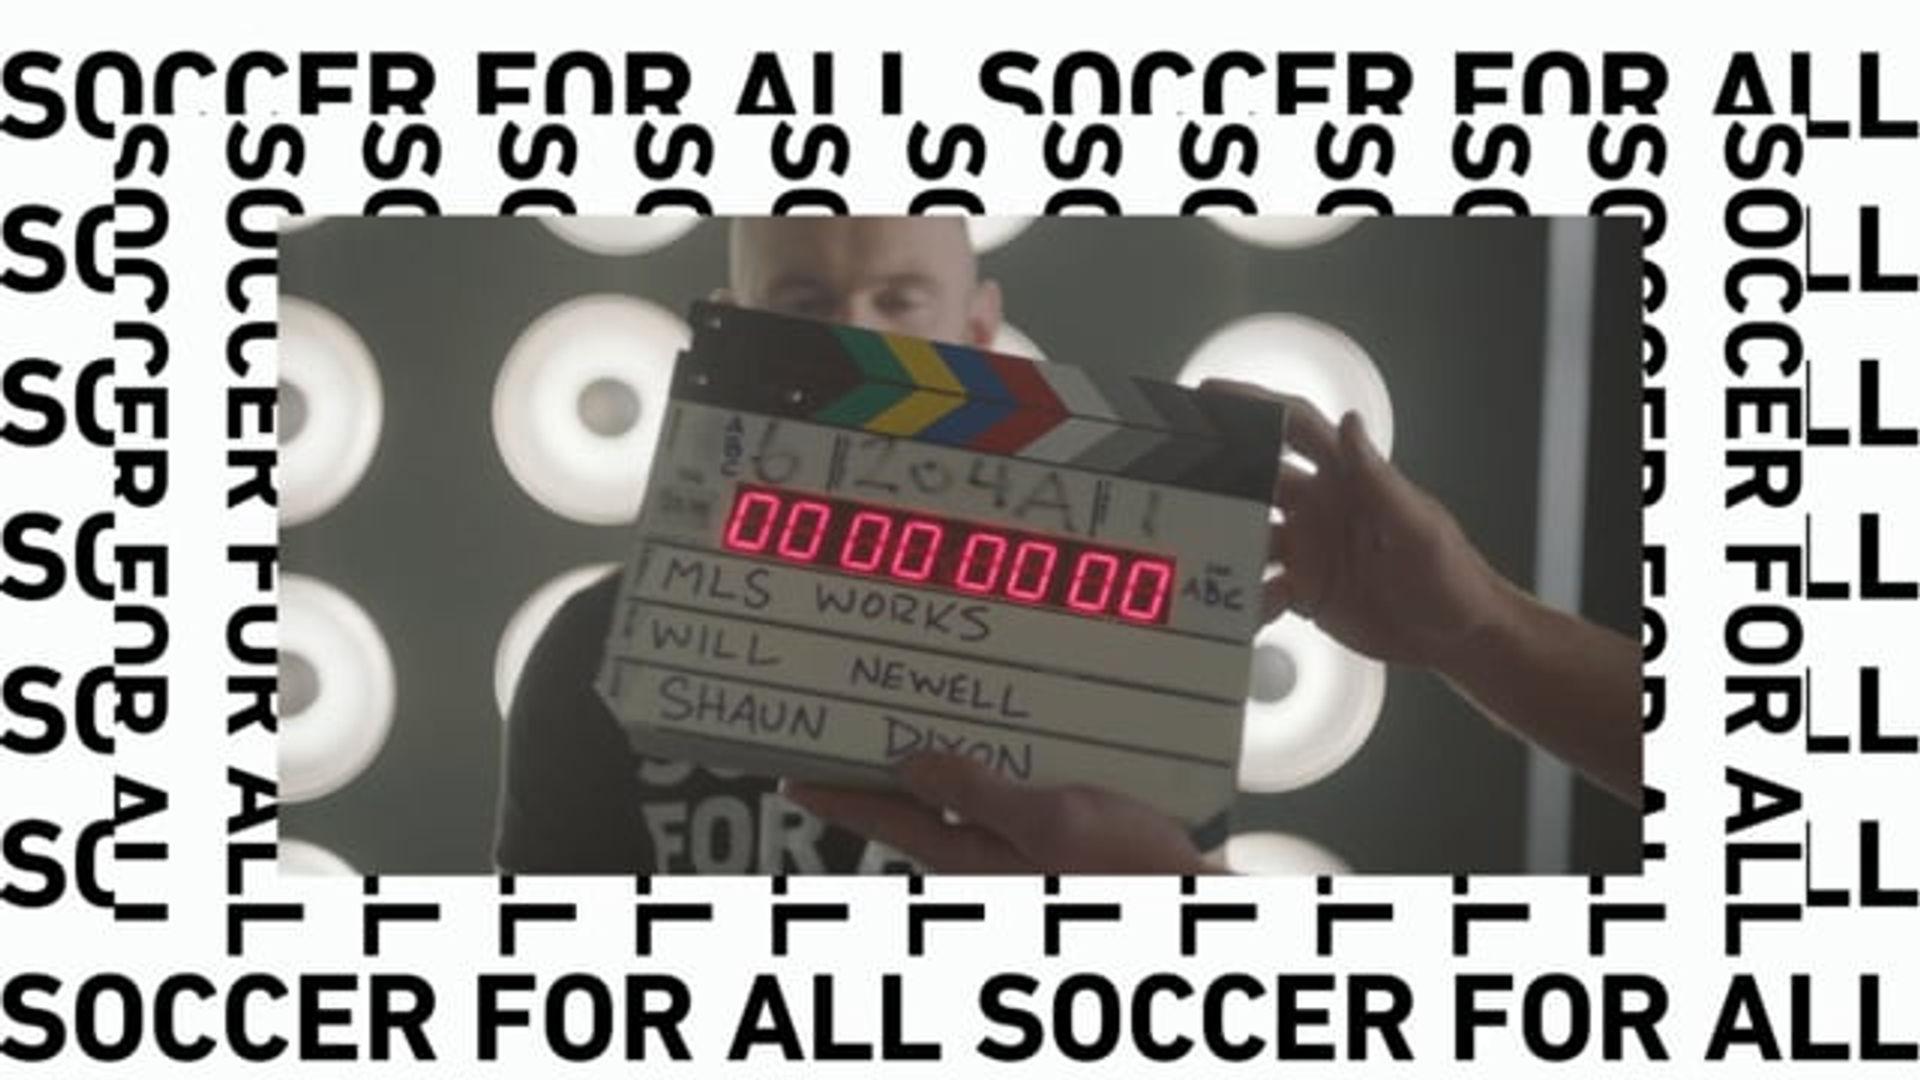 BEHIND THE SCENES VIDEO